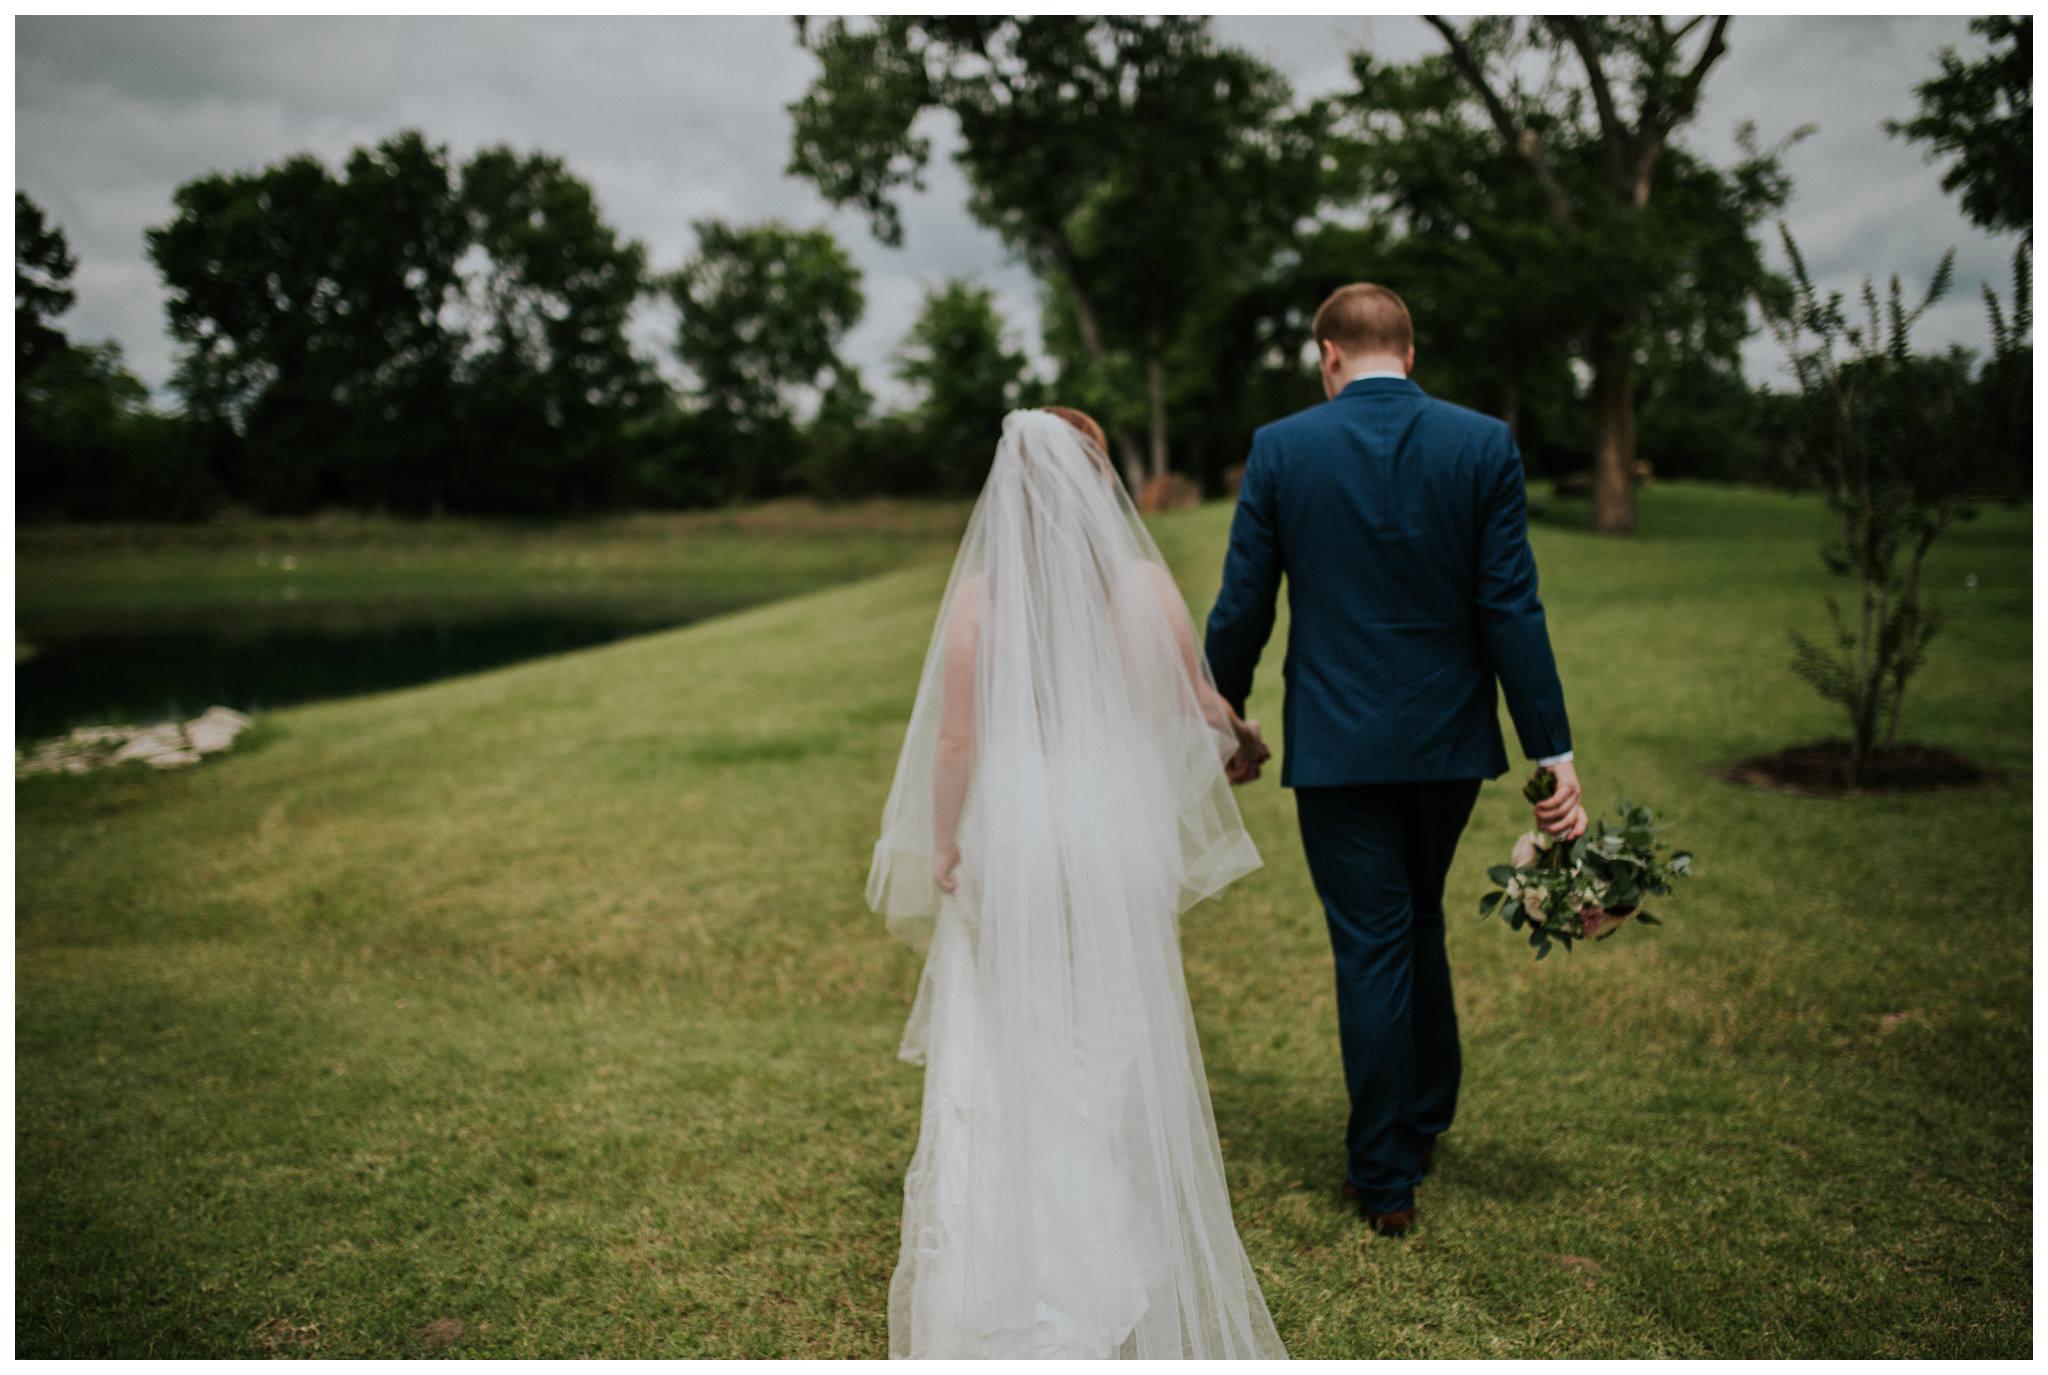 Summertime Olde Dobbin Station - Magnolia Wedding - The Woodlands Texas Wedding Photographer-2465.jpg